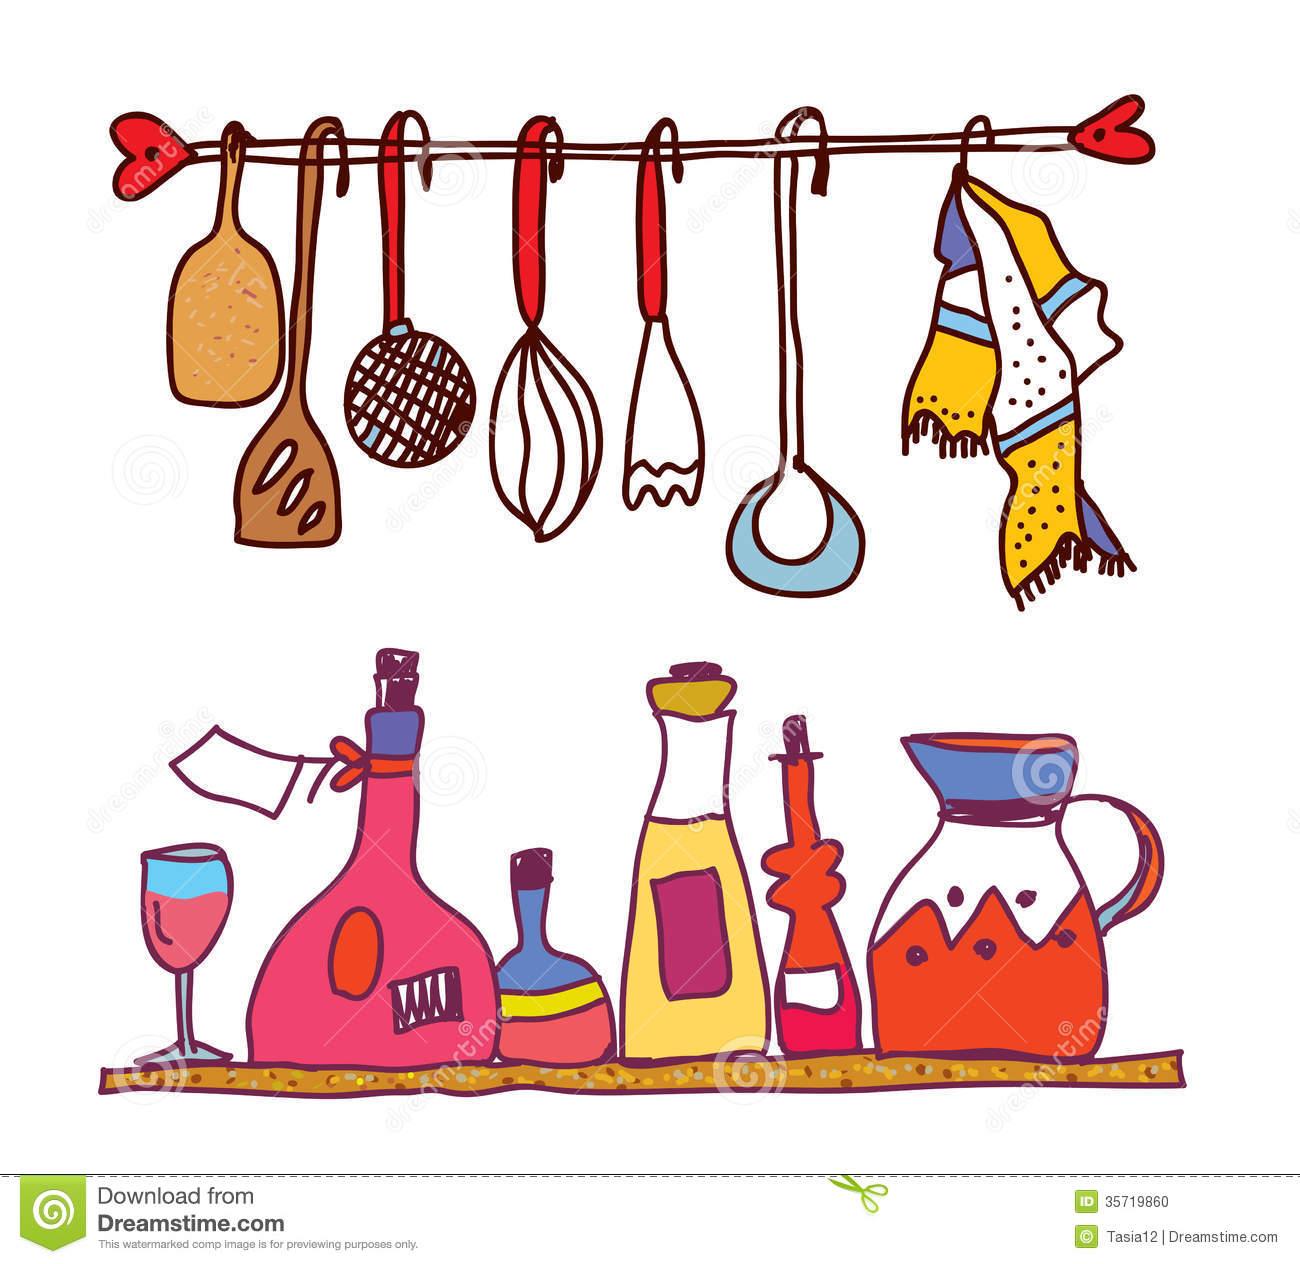 Cute Cooking Utensils Clipart-cute cooking utensils clipart-8